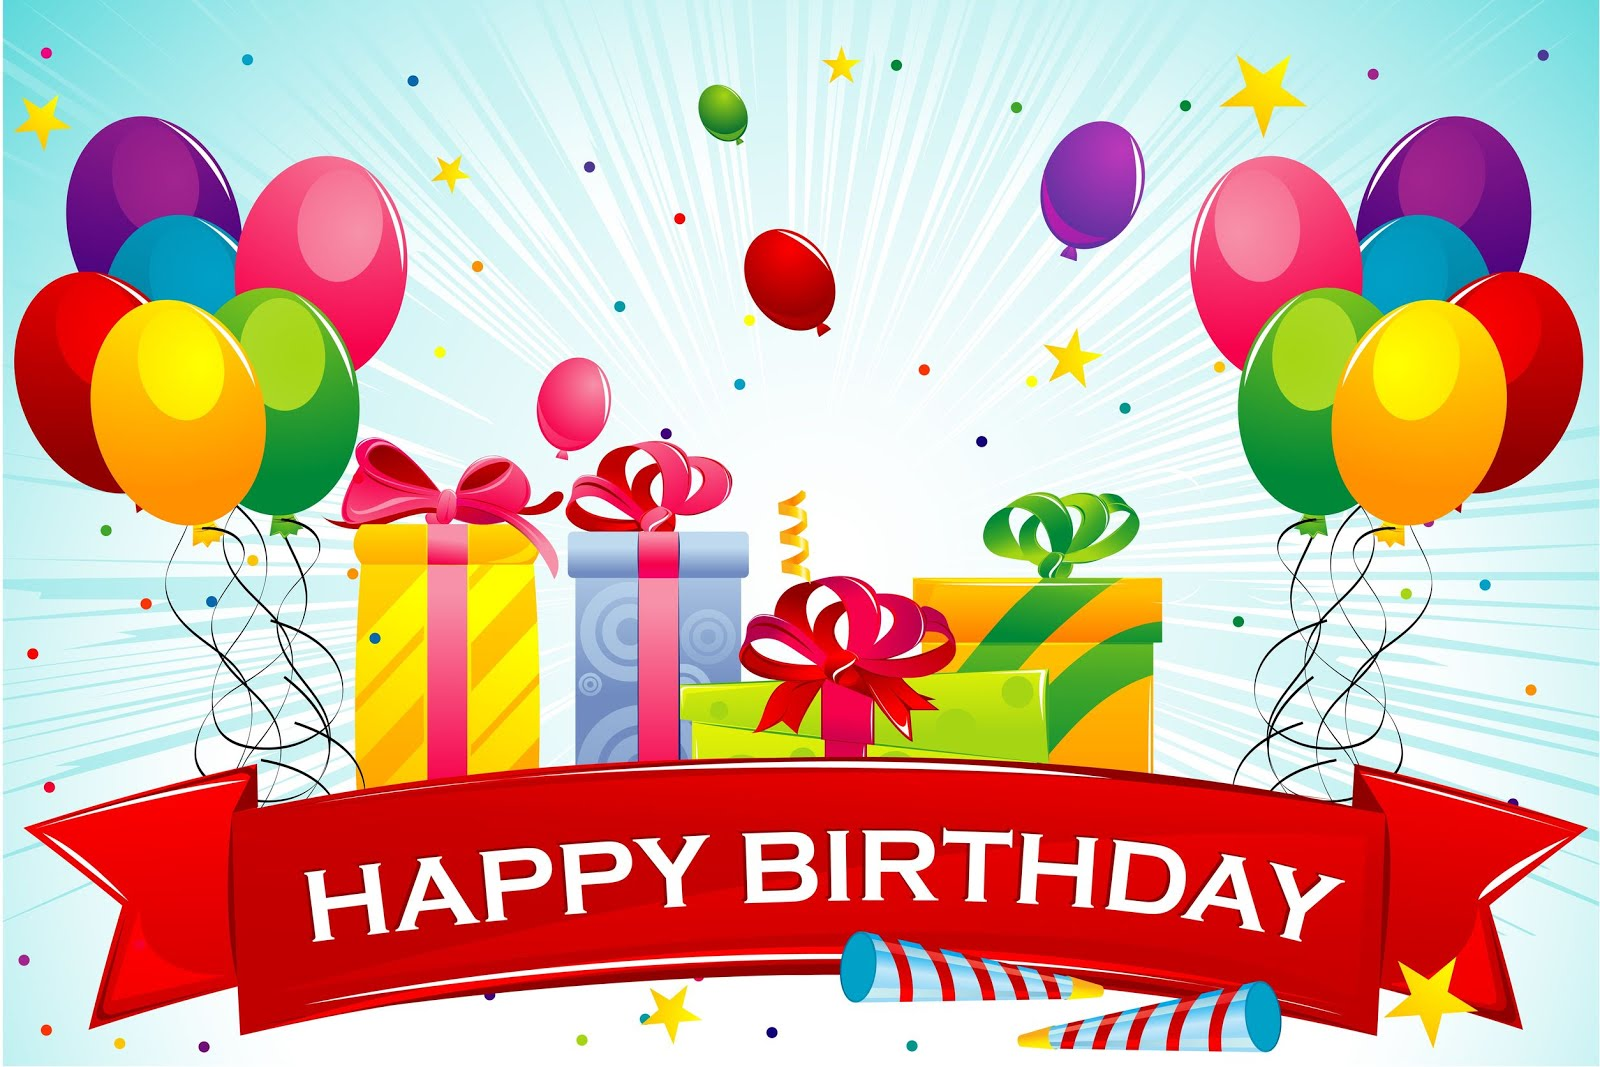 Happy Birthday Desktop Background wallpaper Happy Birthday Desktop 1600x1067